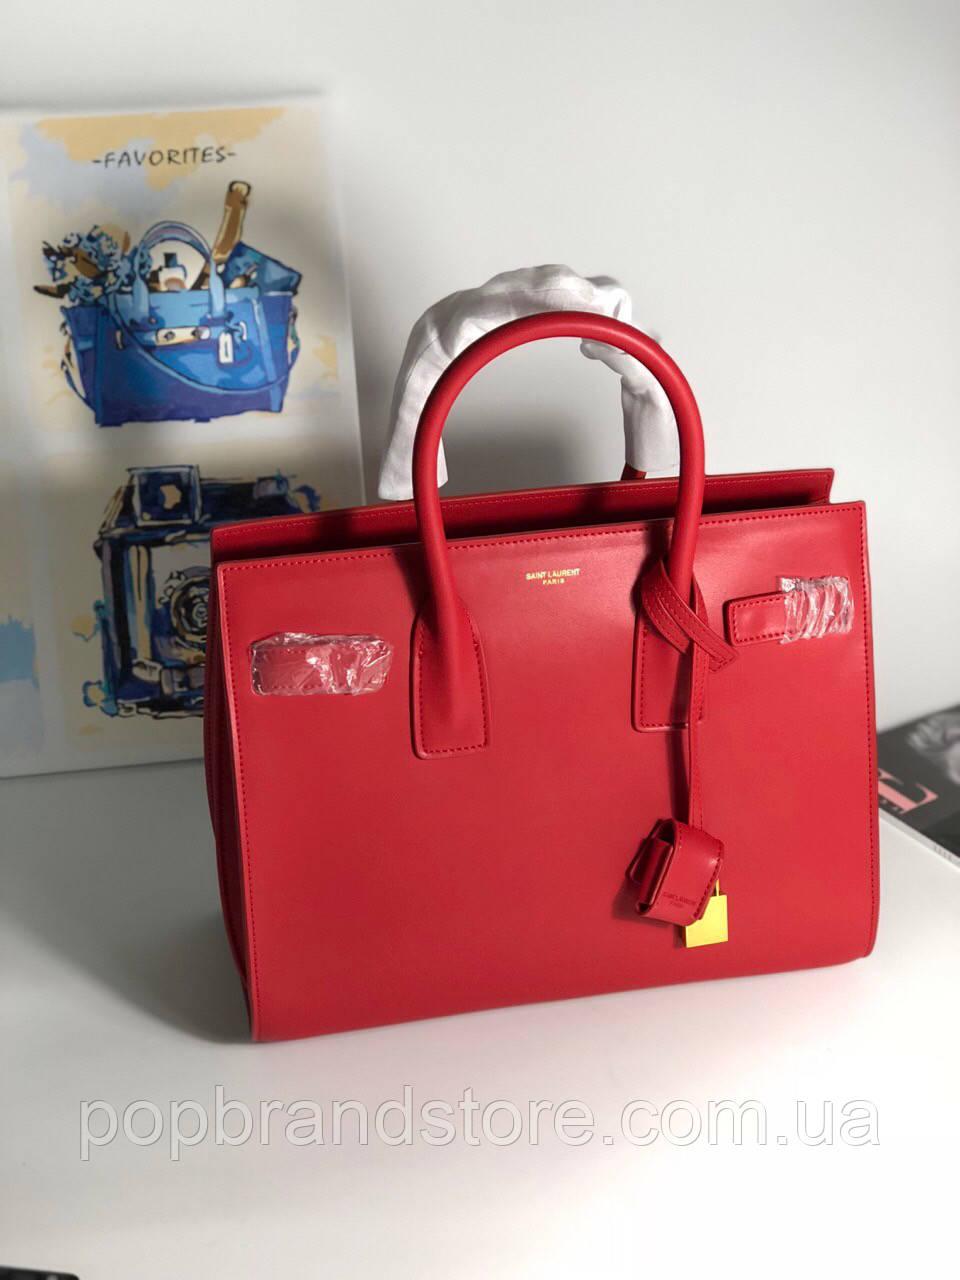 5a8f6377d7dd Классическая женская сумка SAINT LAURENT Sac de Jour красная (реплика) -  Pop Brand Store